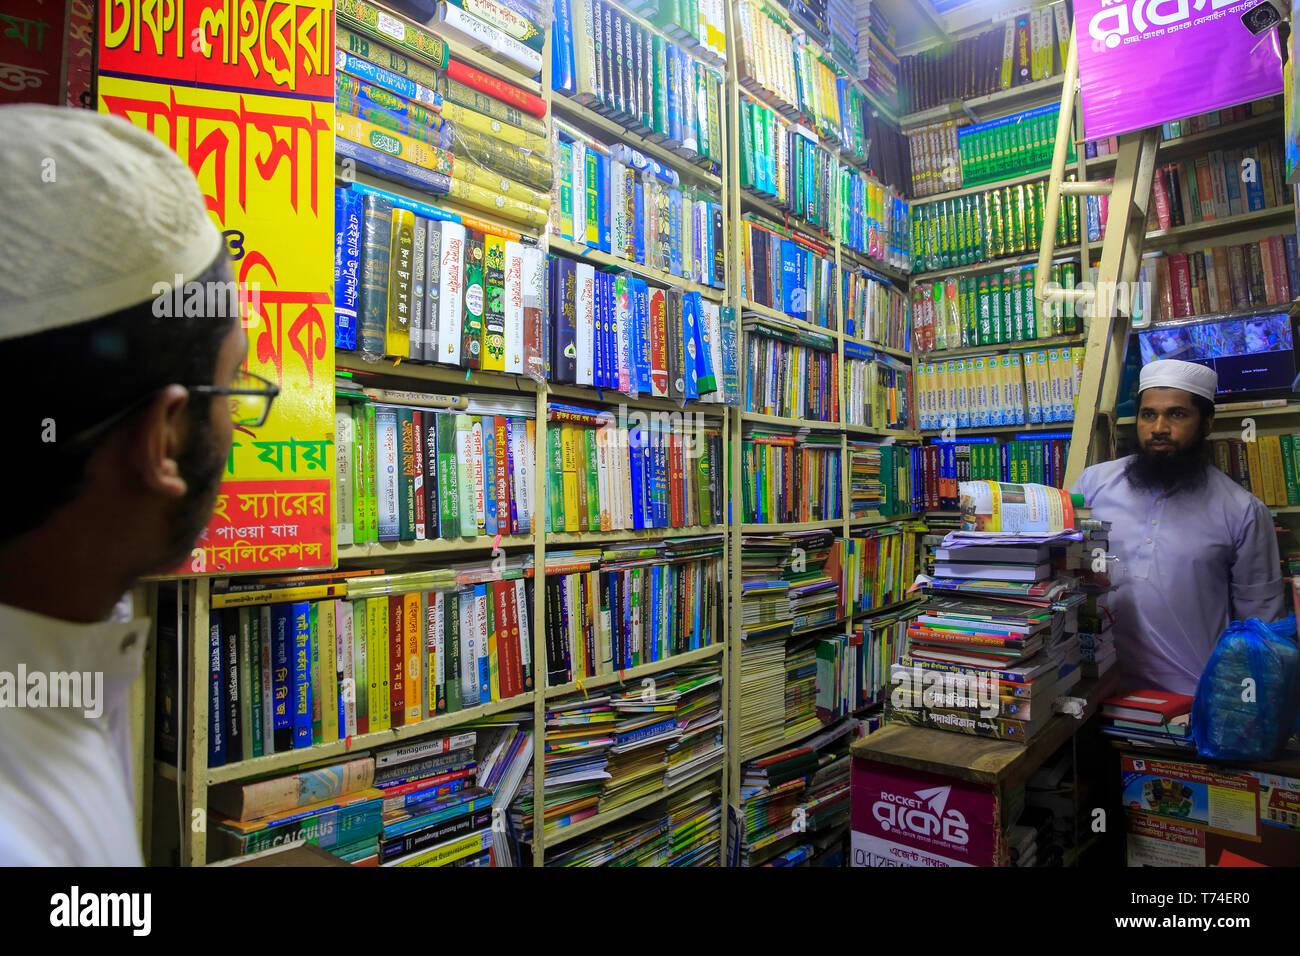 An Islamic bookshop at Nilkhet Book MArket. Dhaka, Bangladesh. - Stock Image